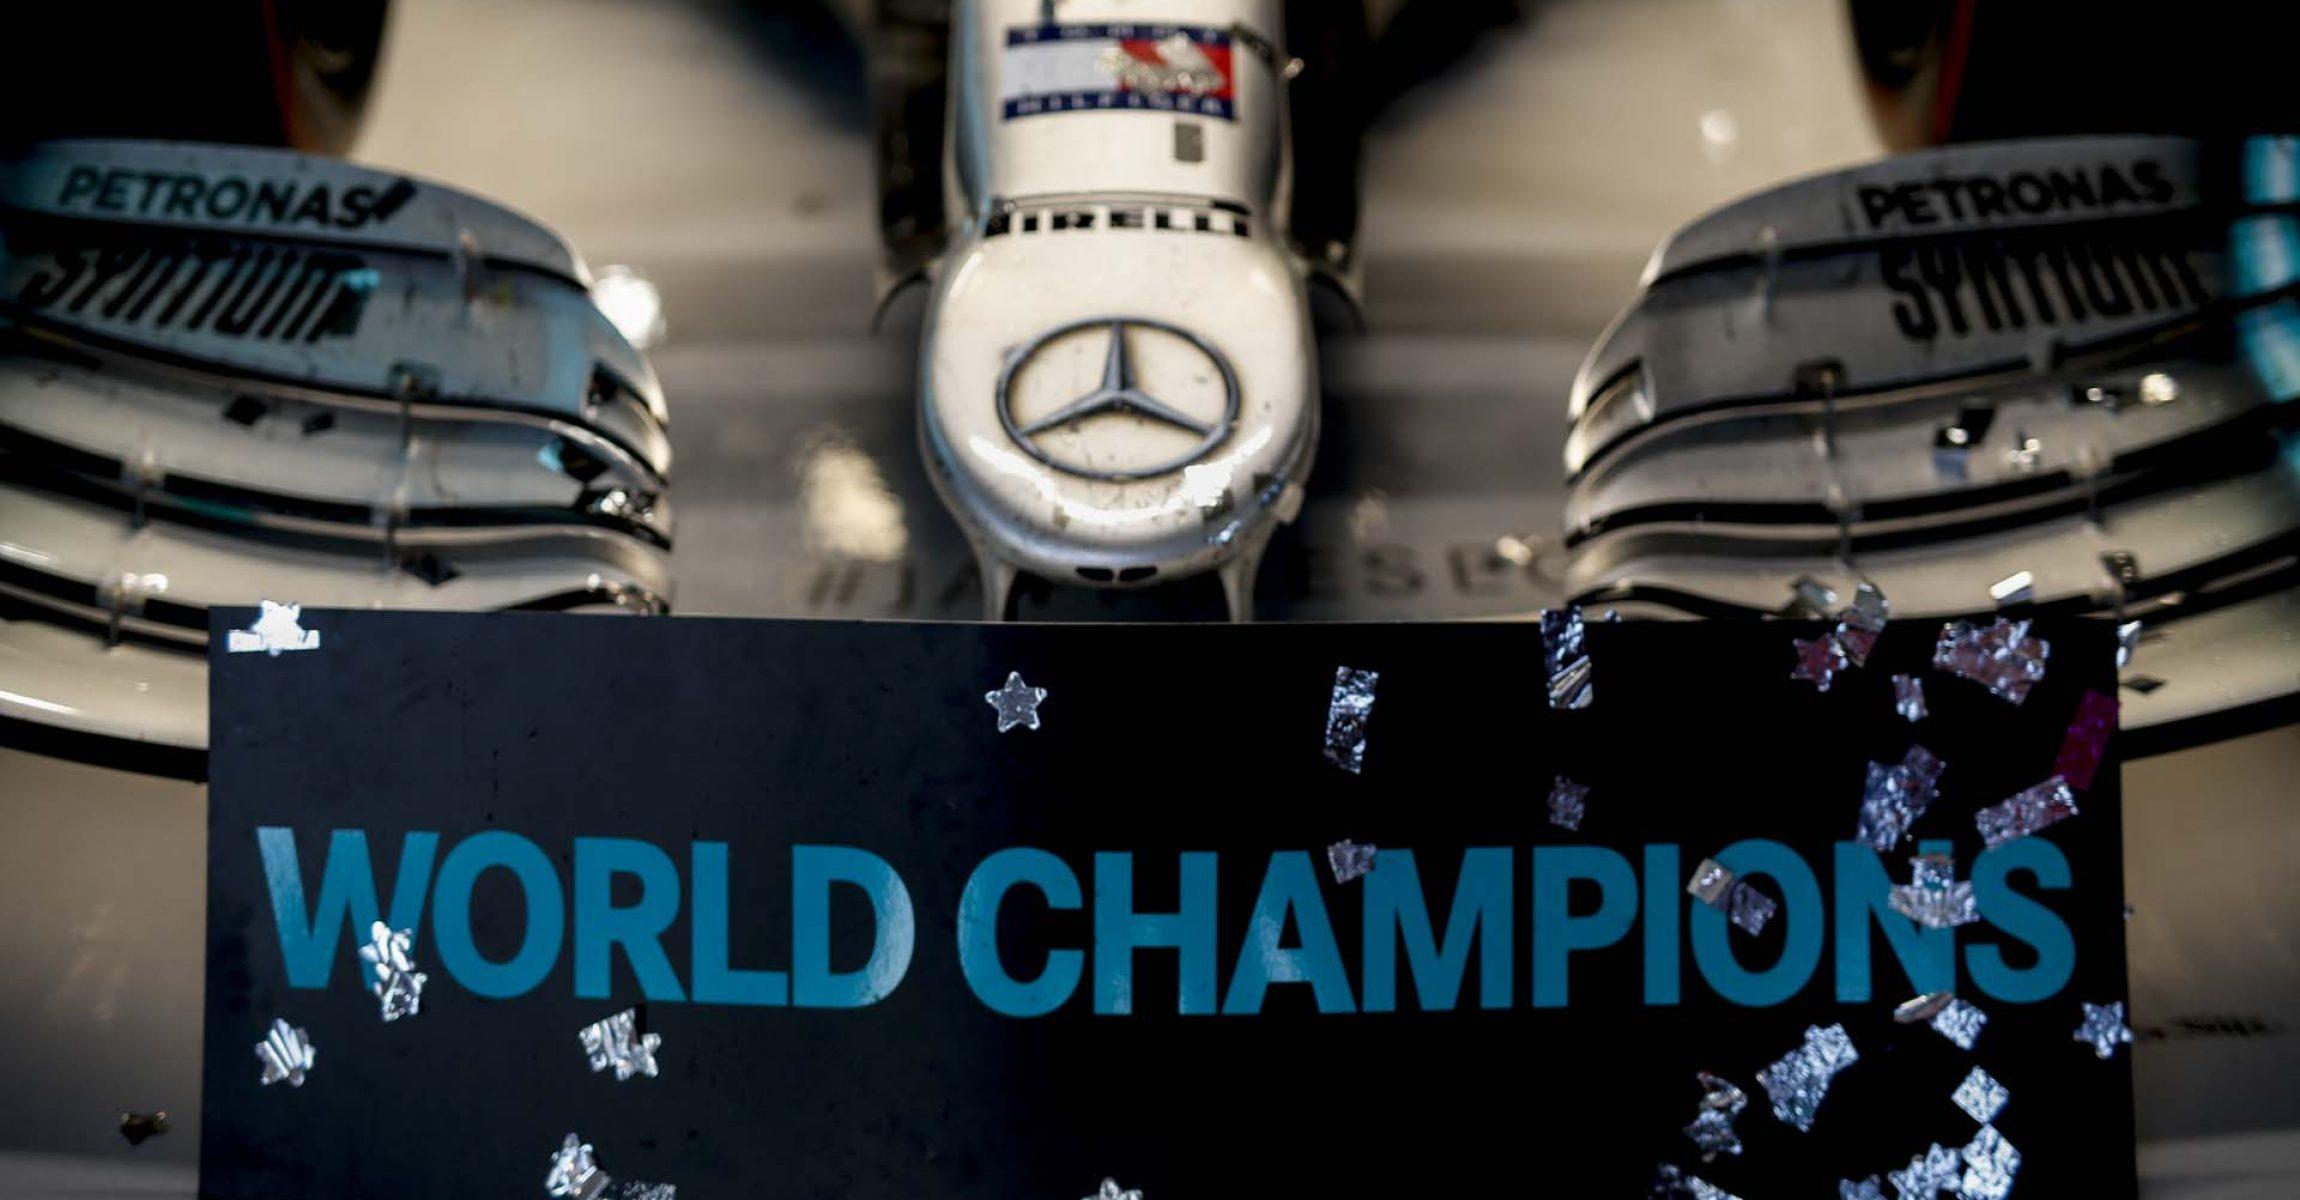 2019 Japanese Grand Prix, Sunday - Wolfgang Wilhelm Mercedes constructor champions